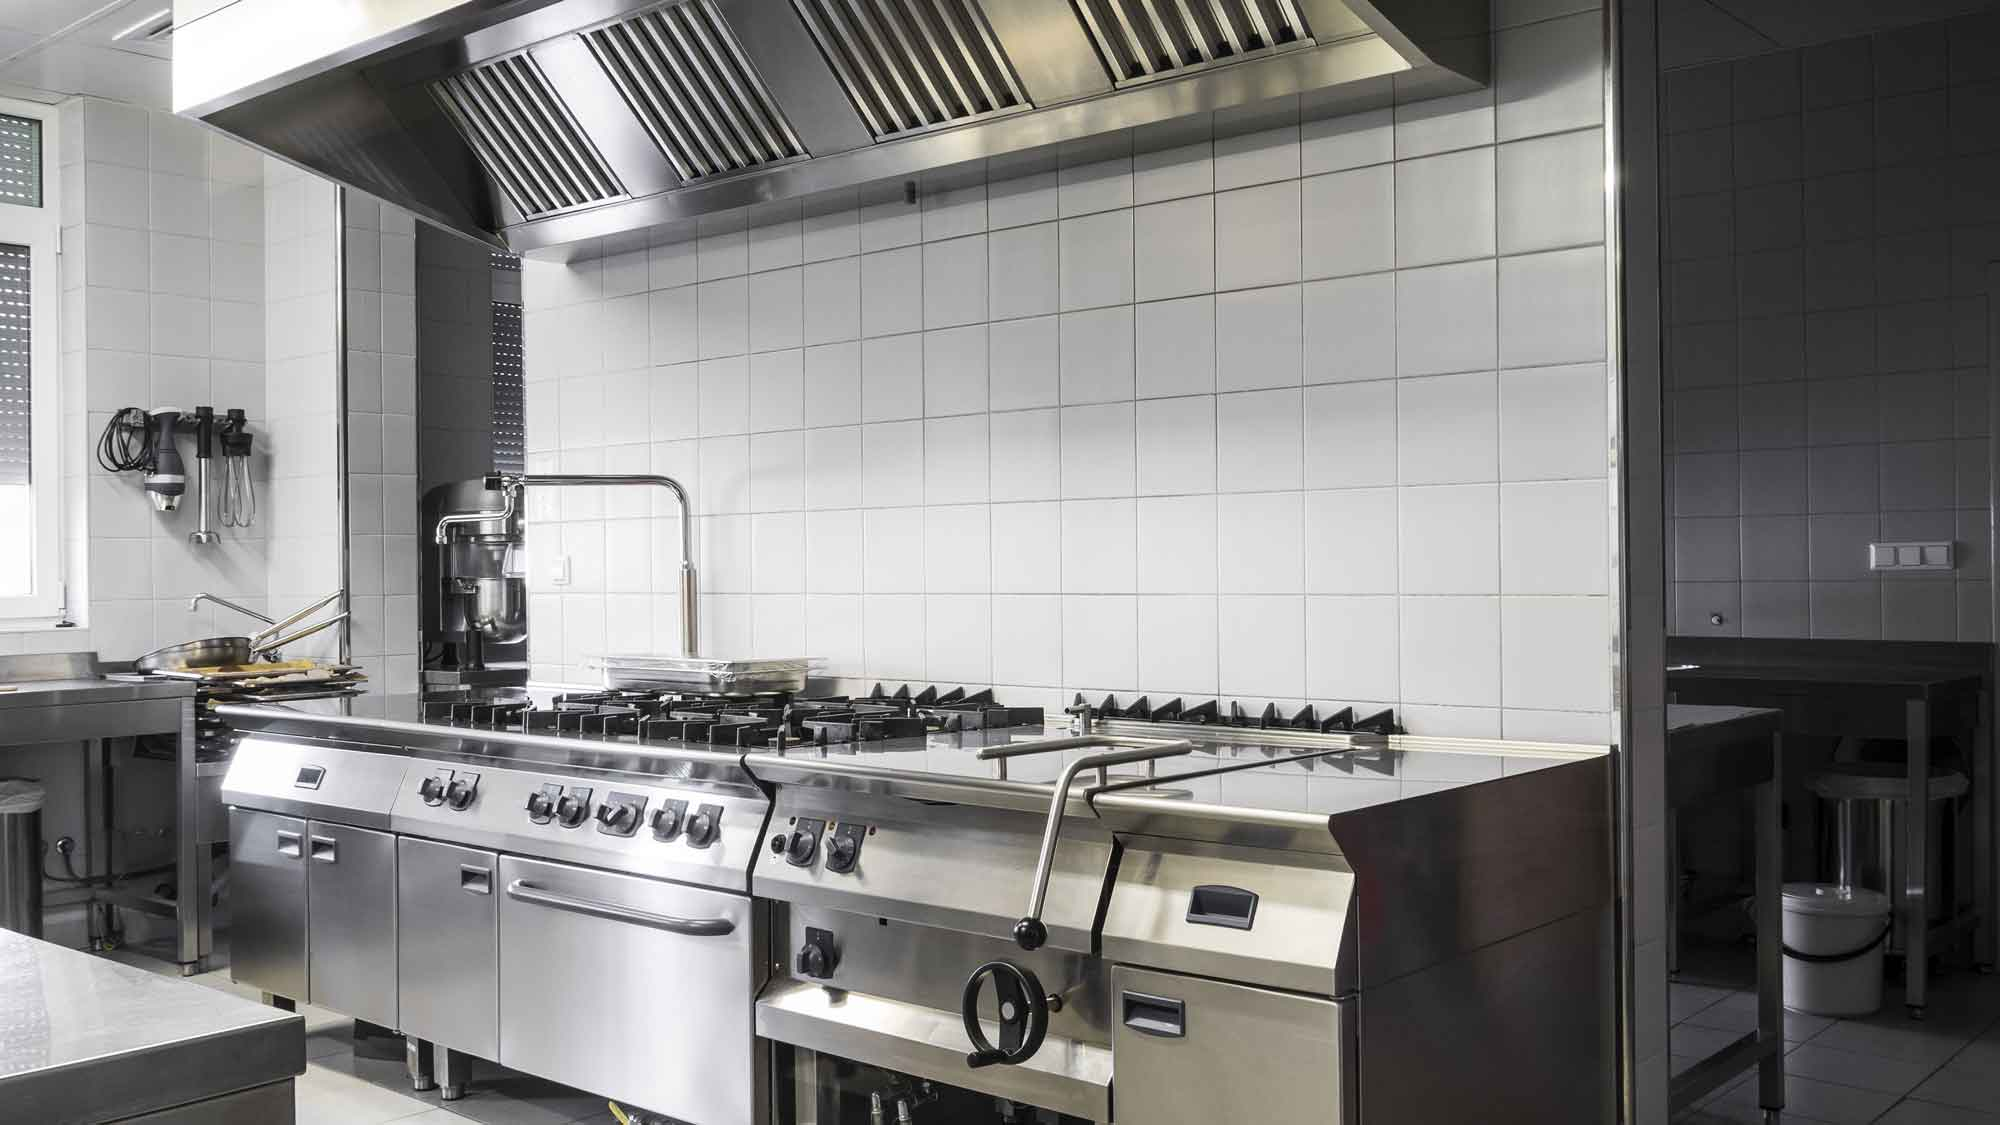 catering equipment repairs essex maintenance leigh on sea kitchen 2